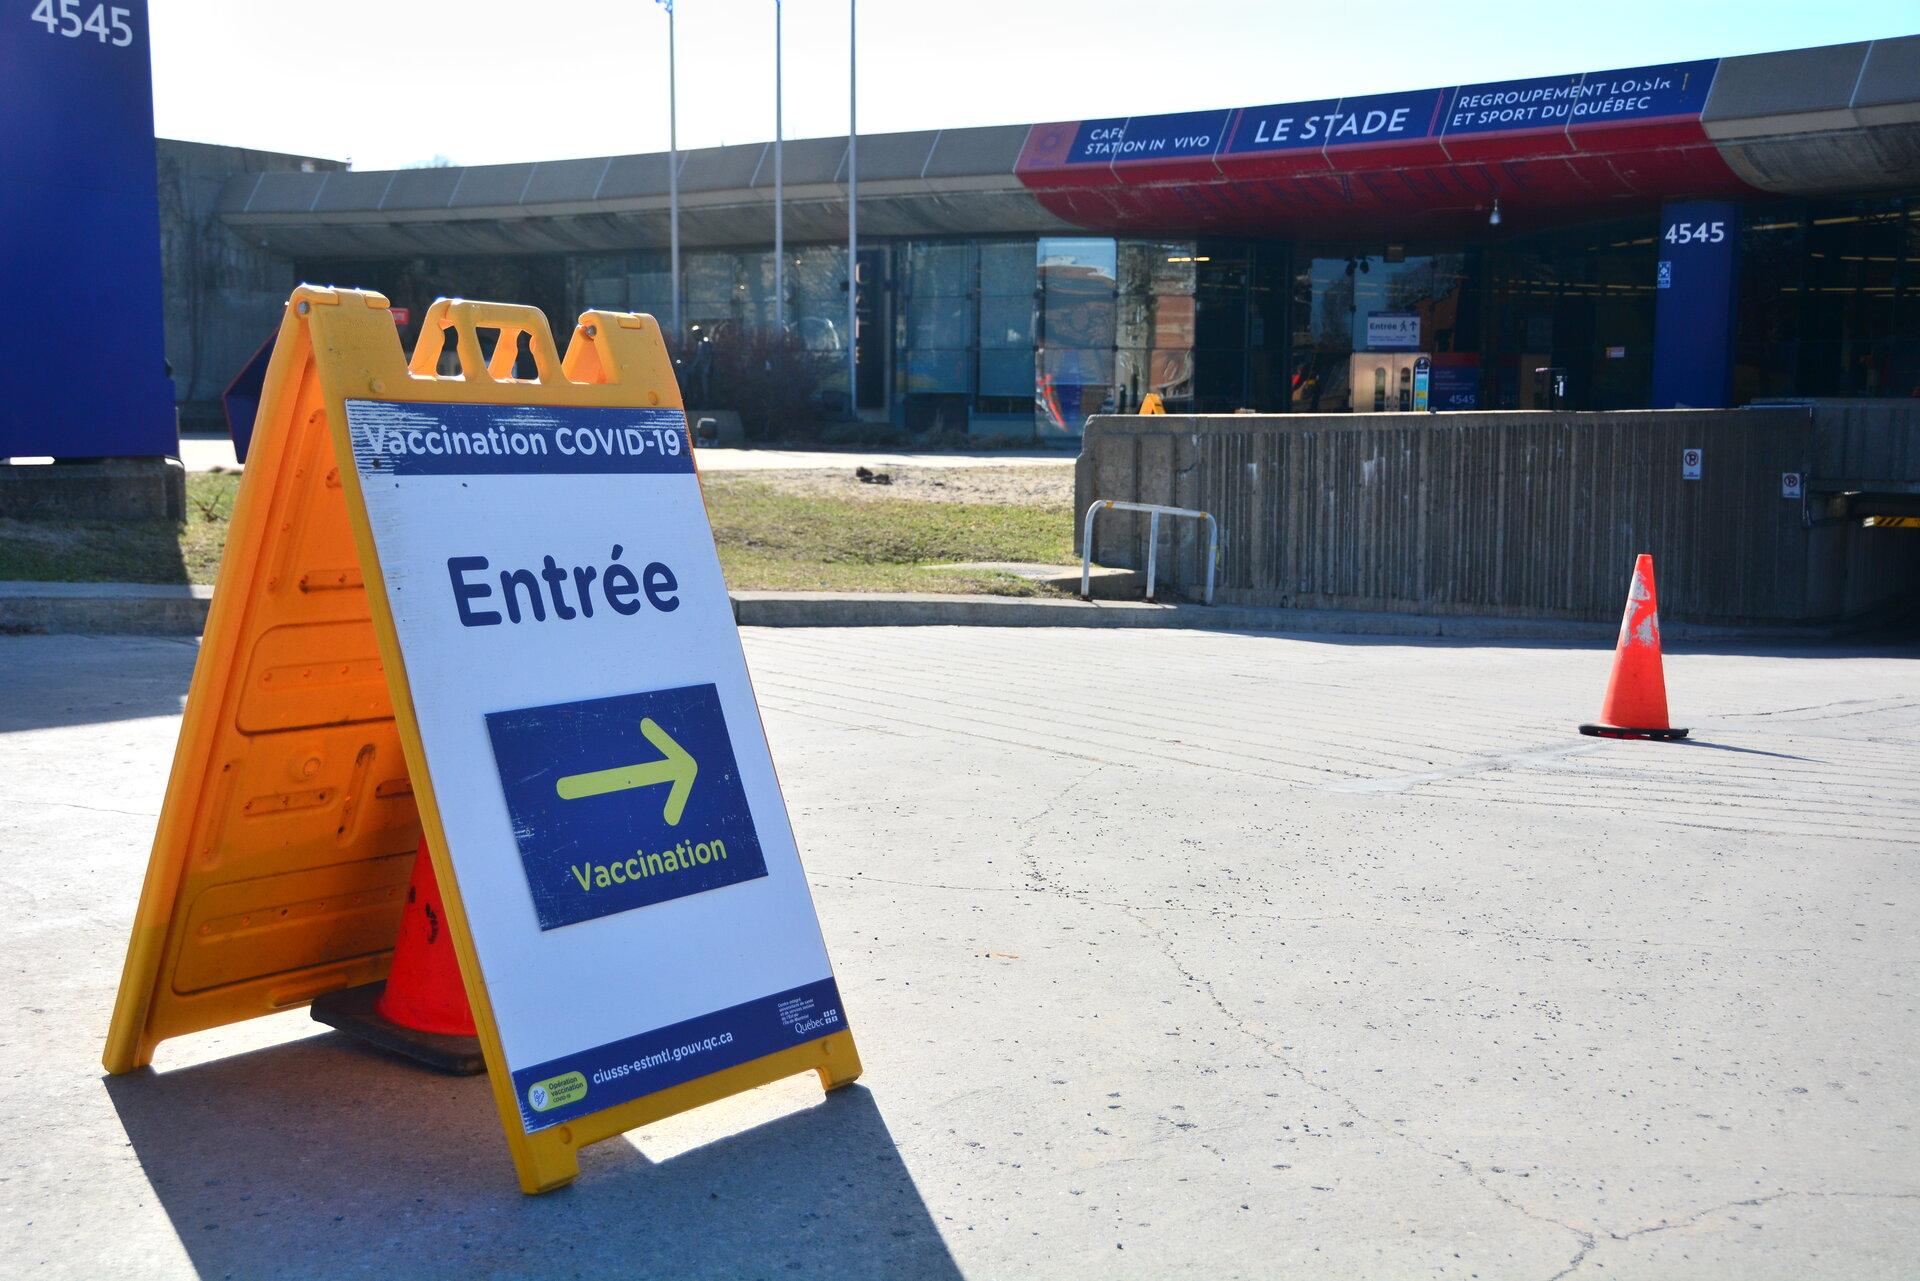 A vaccination centre entrance sign.